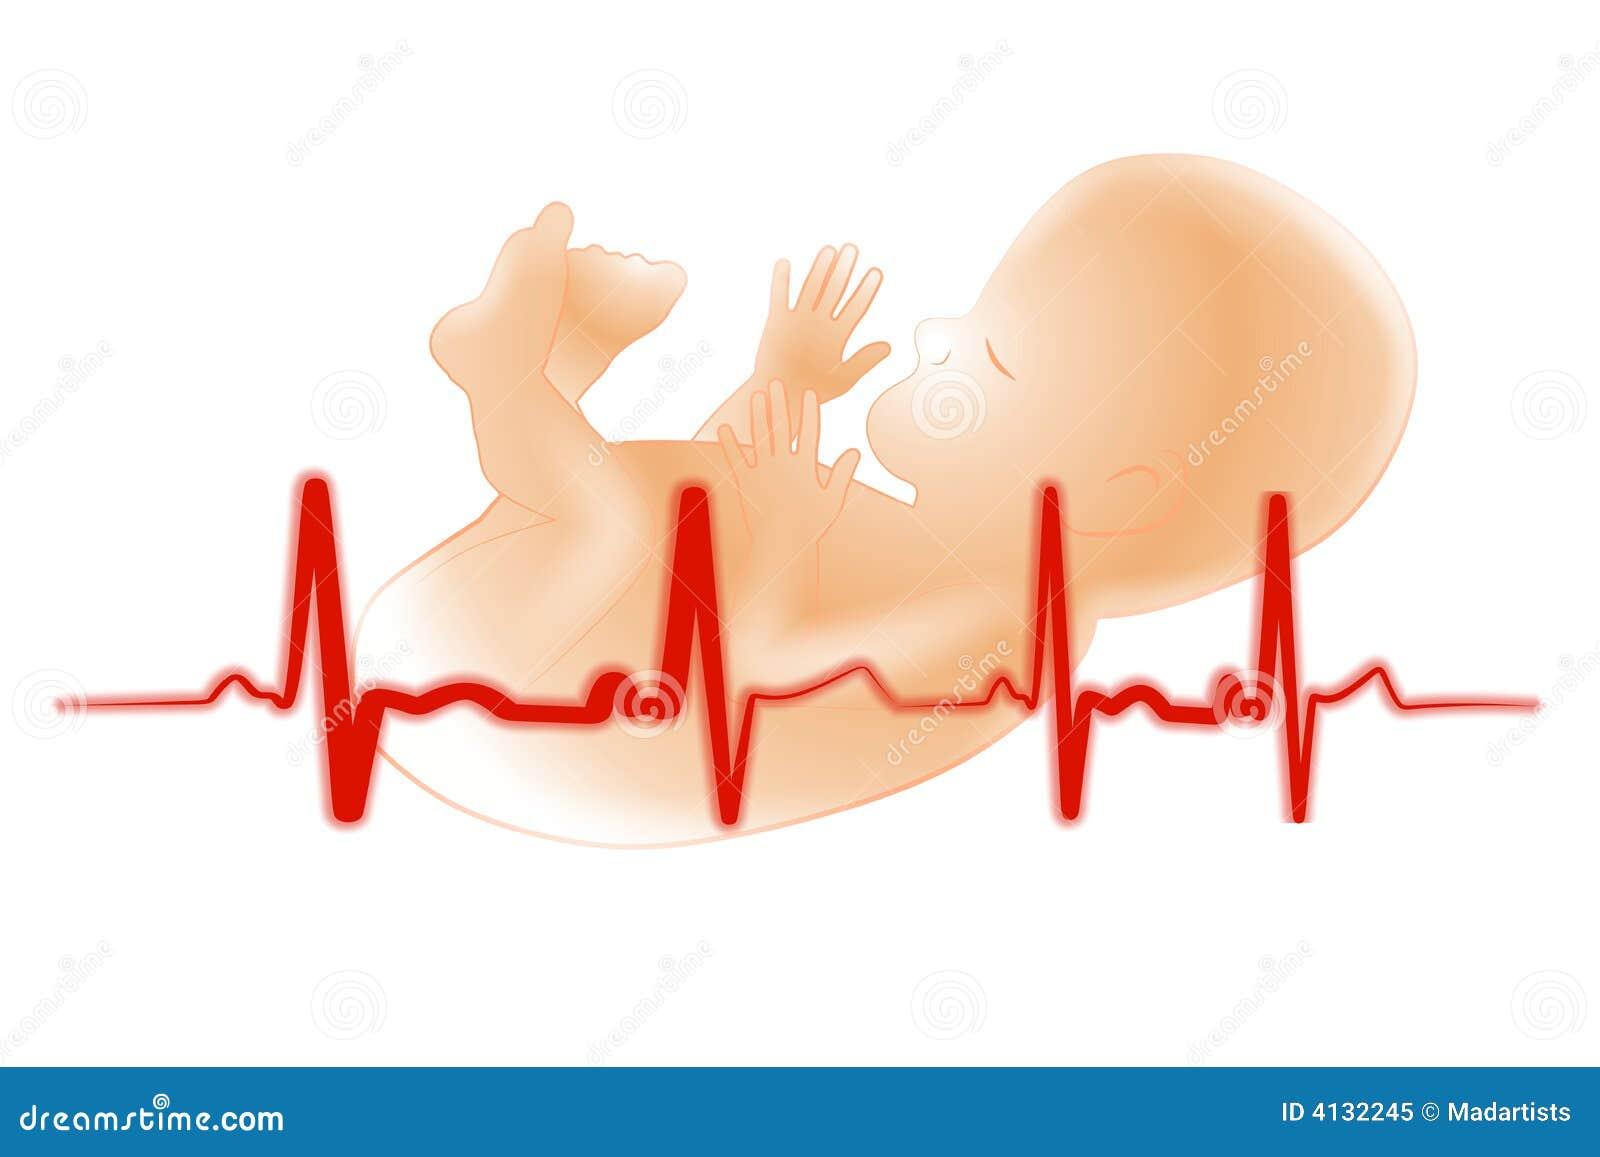 Premature Baby Fetus Electrocardiogram Royalty Free Stock ...